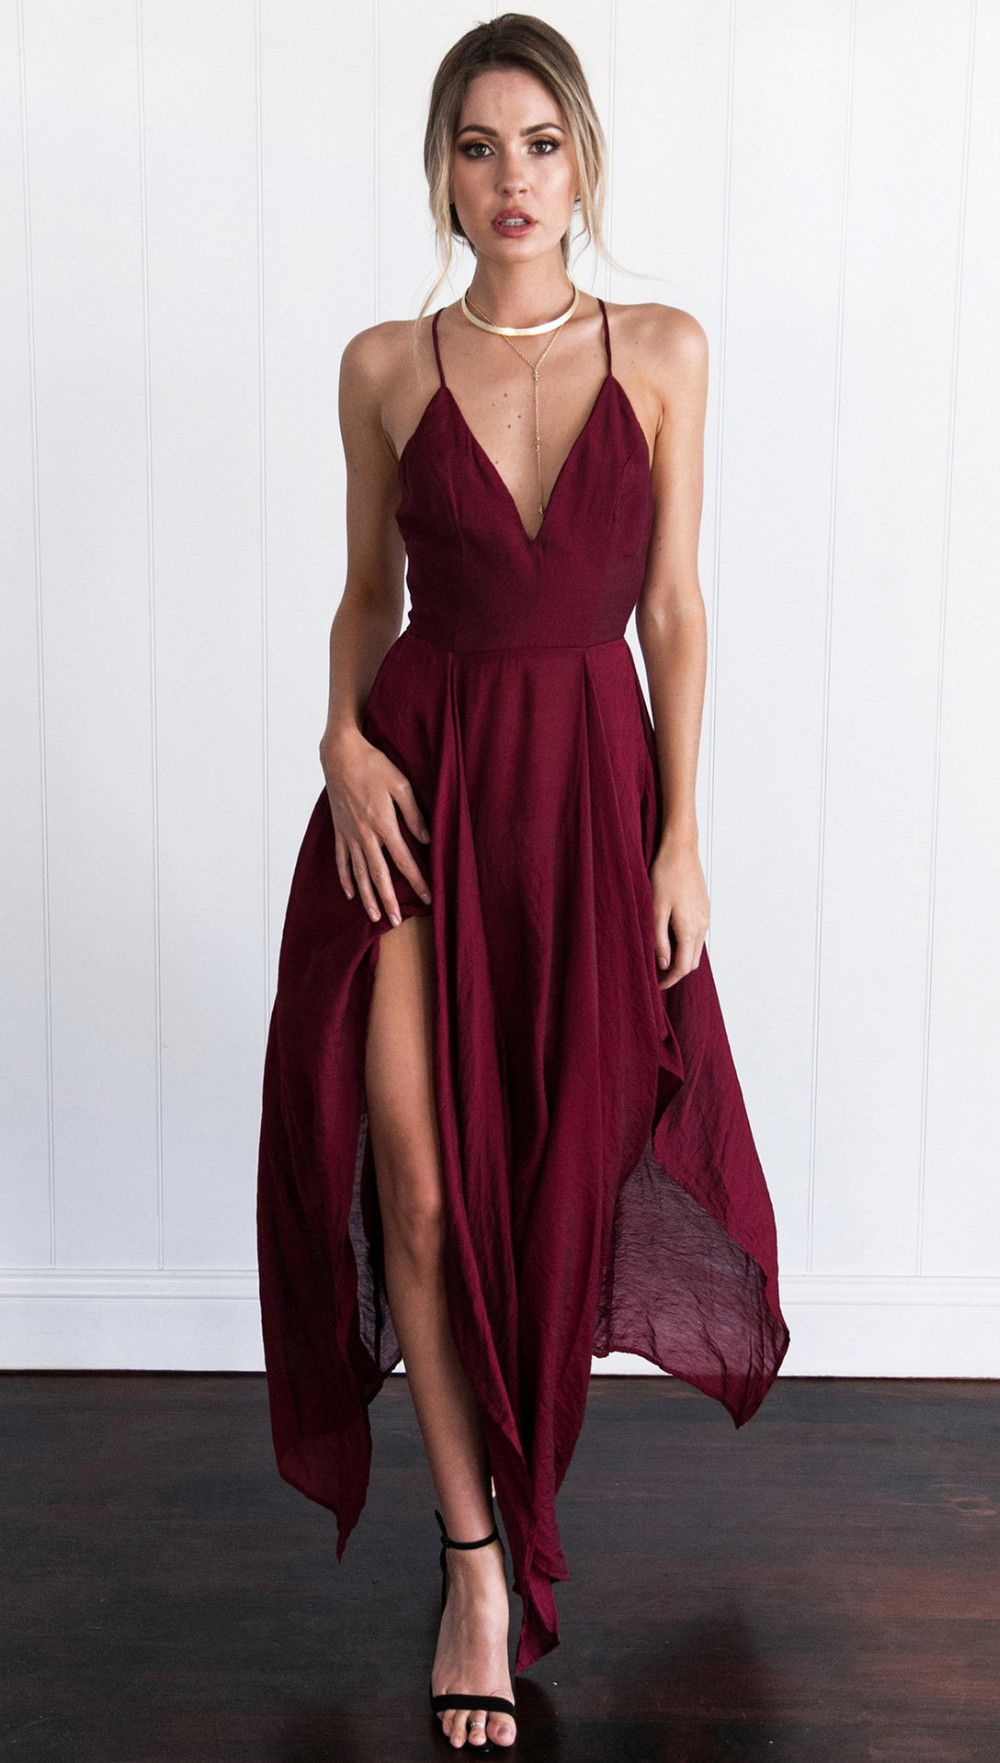 Cross back wine red assymetrical hem long dress dress to impress